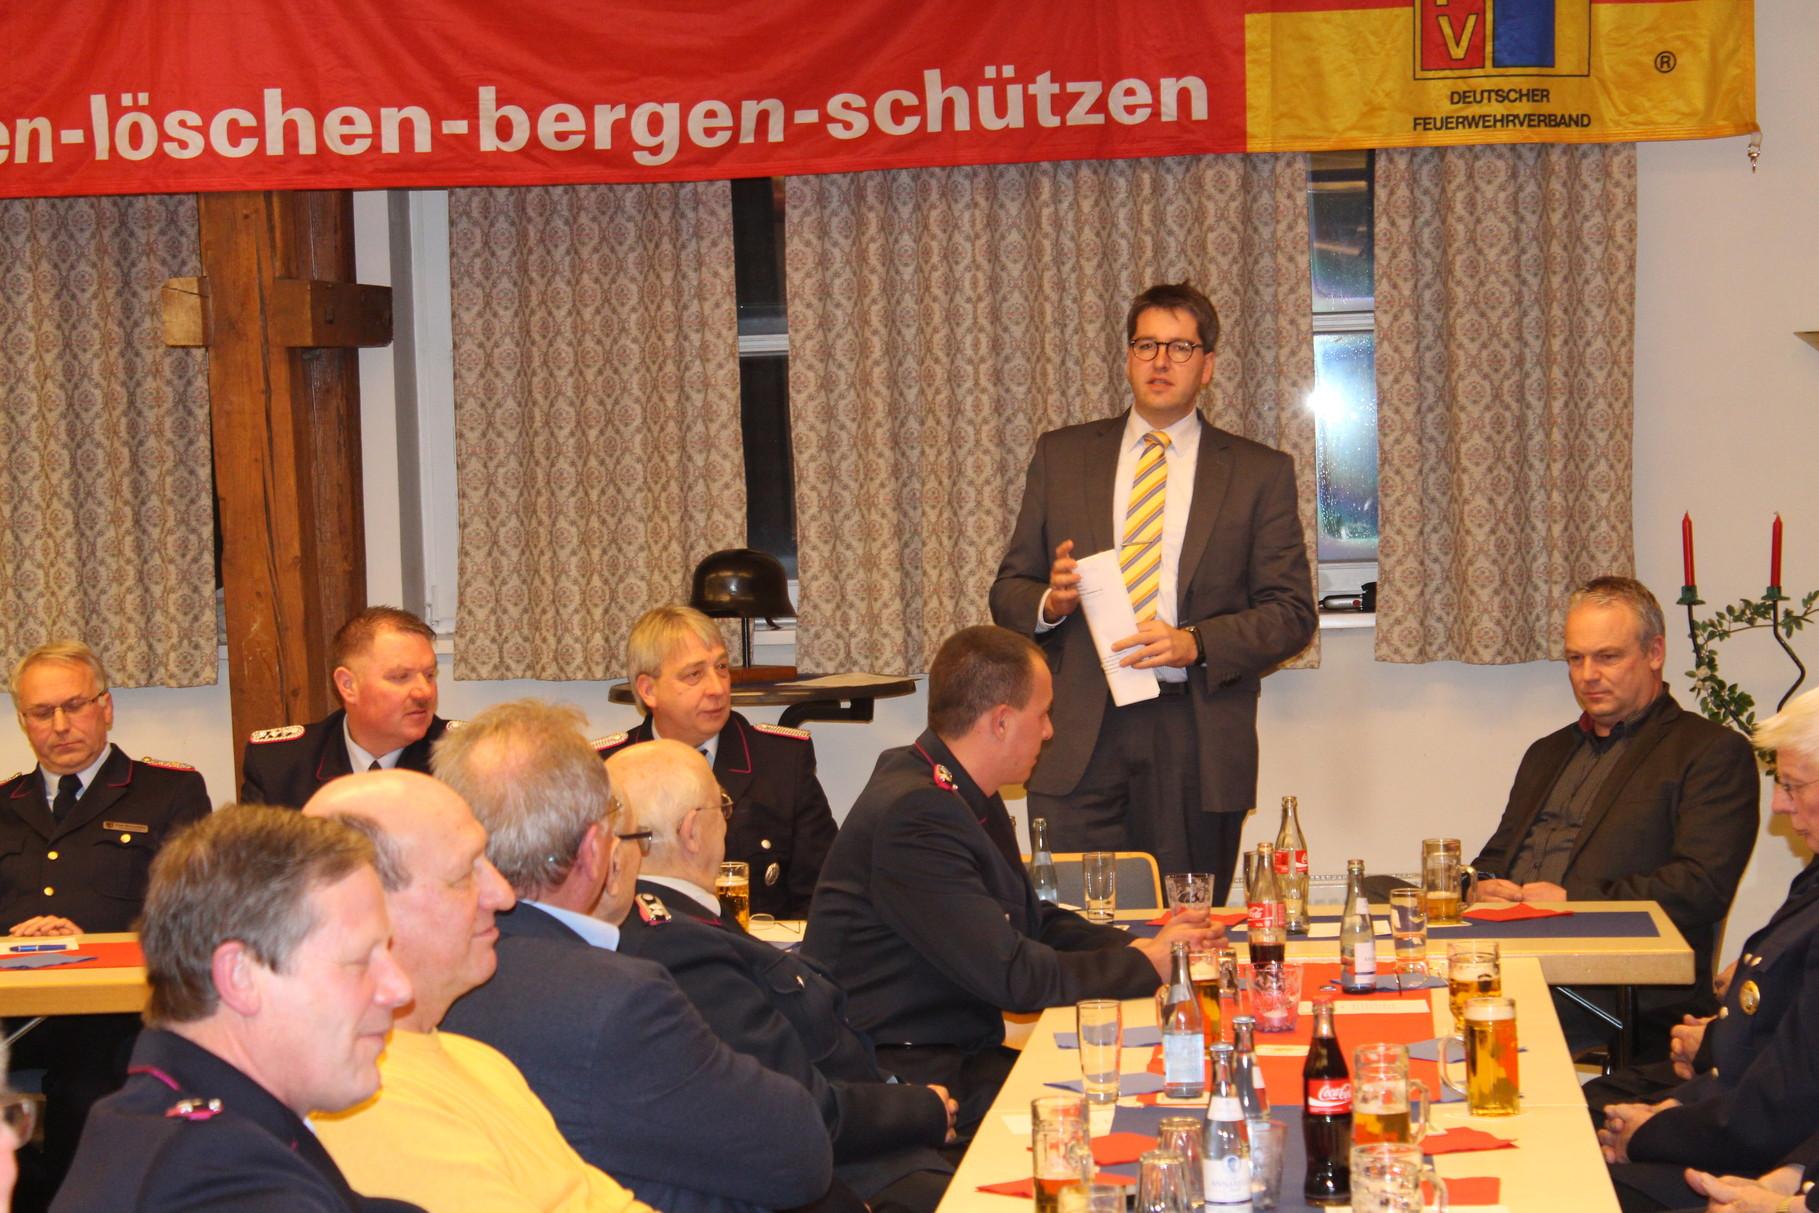 Oberbürgermeister von Goslar  Herr Dr. Oliver Junk